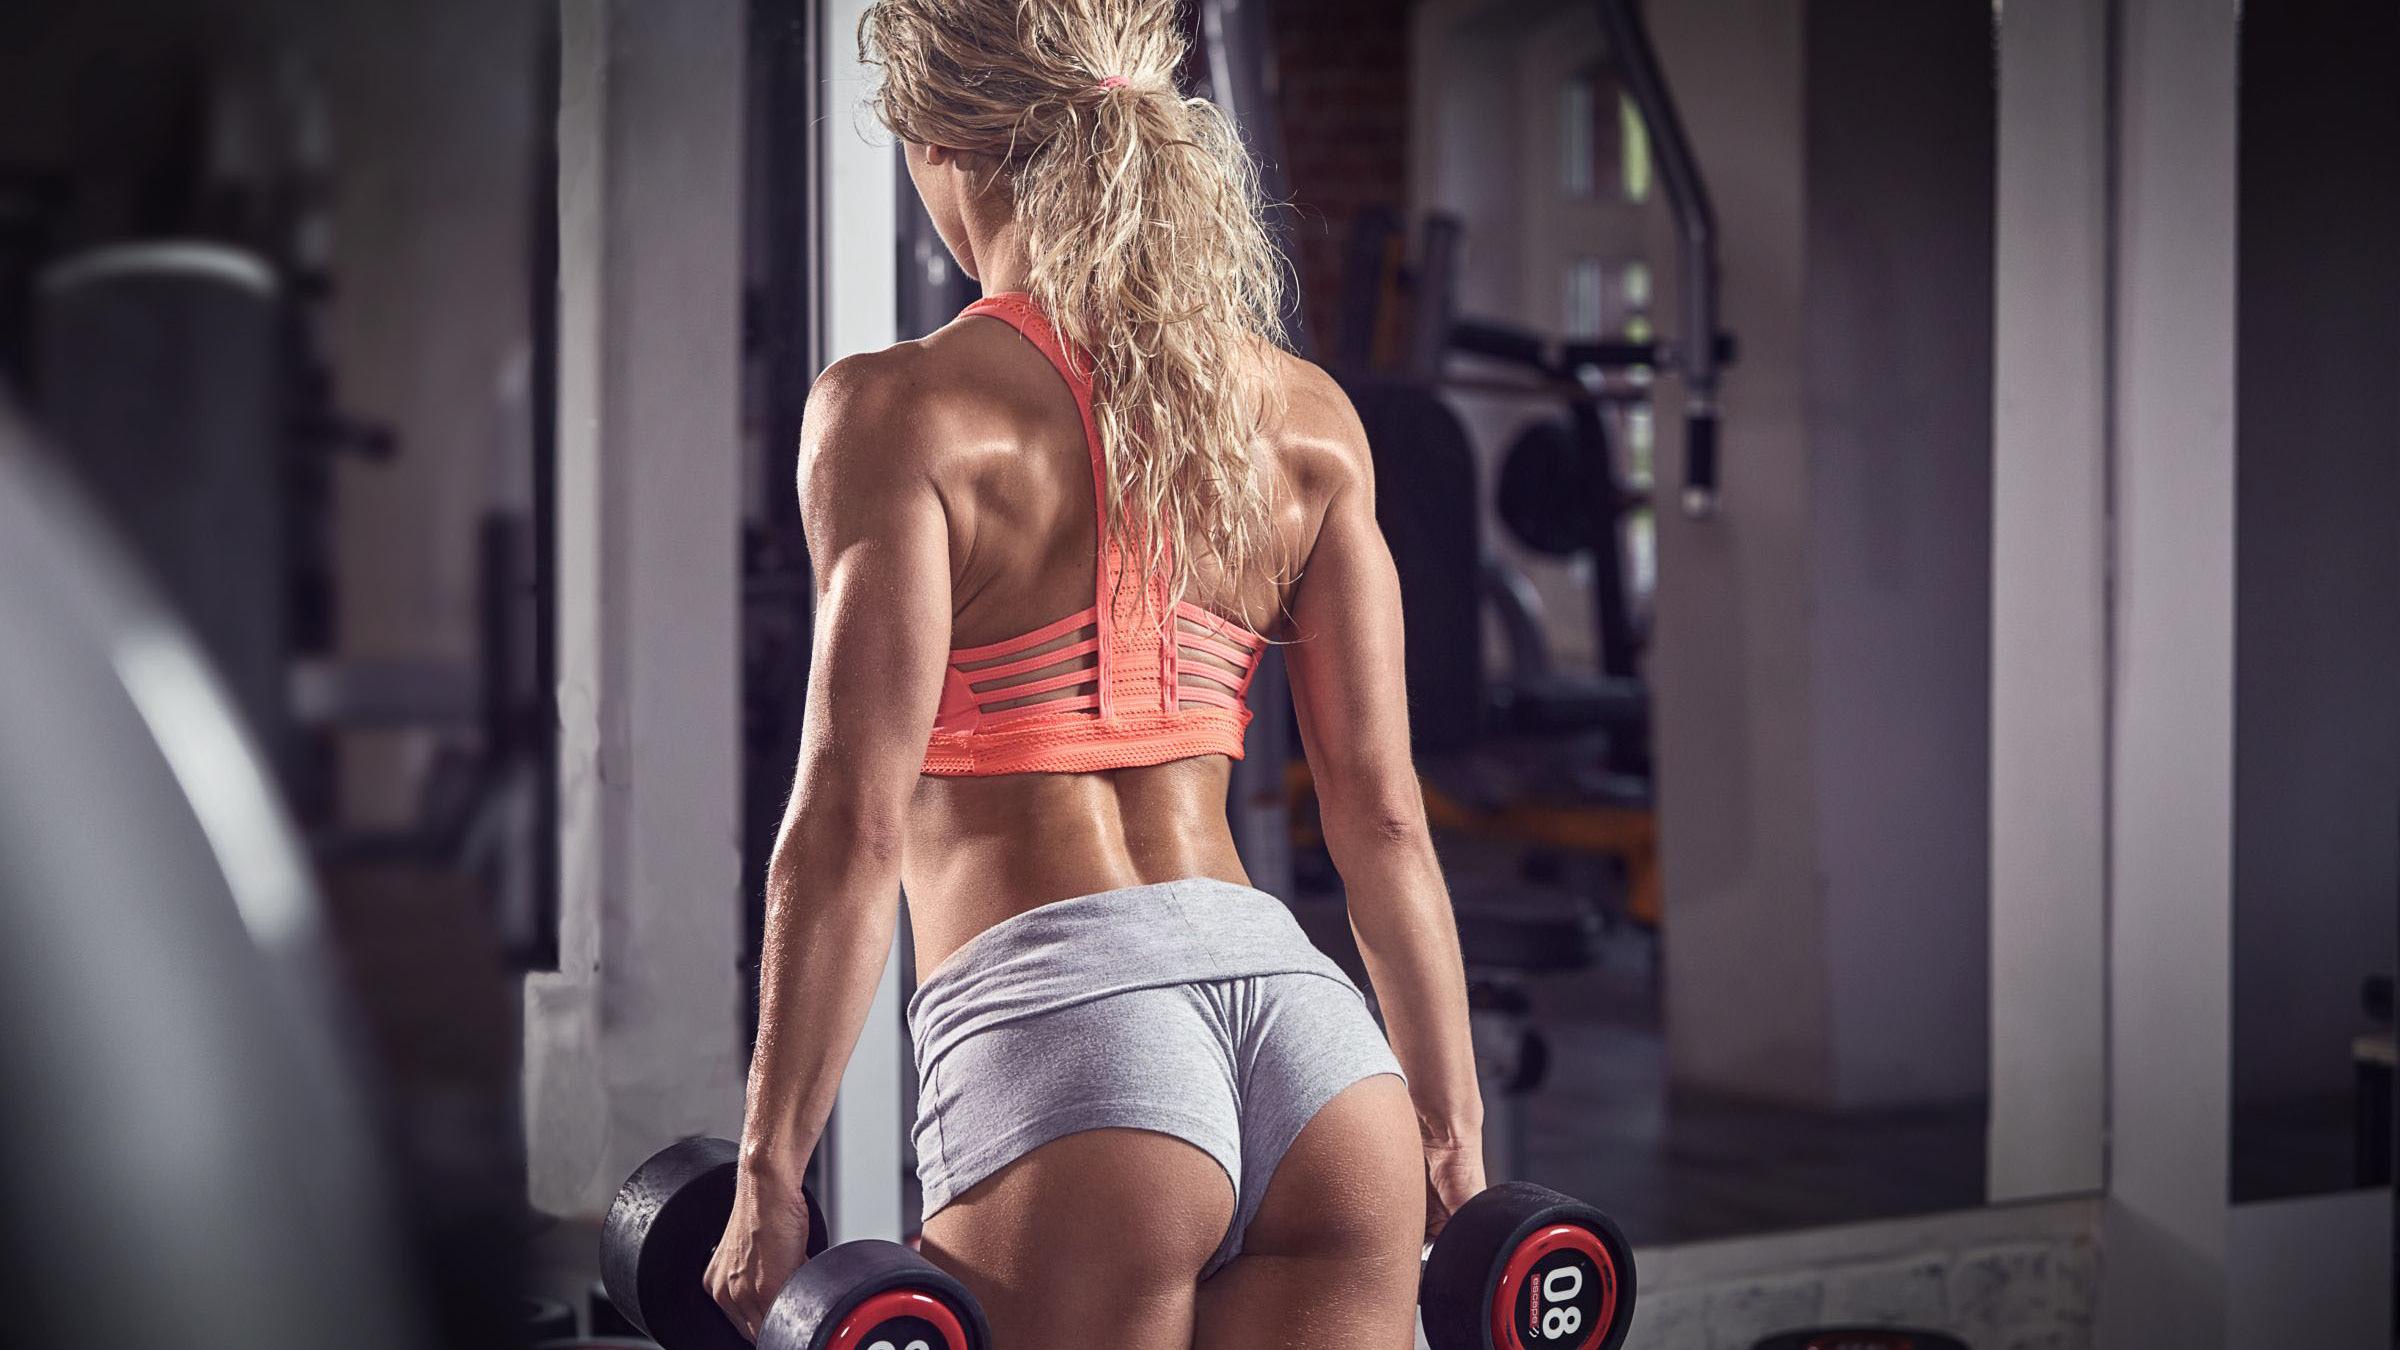 Девушки в спортзале: виды мощних поп!